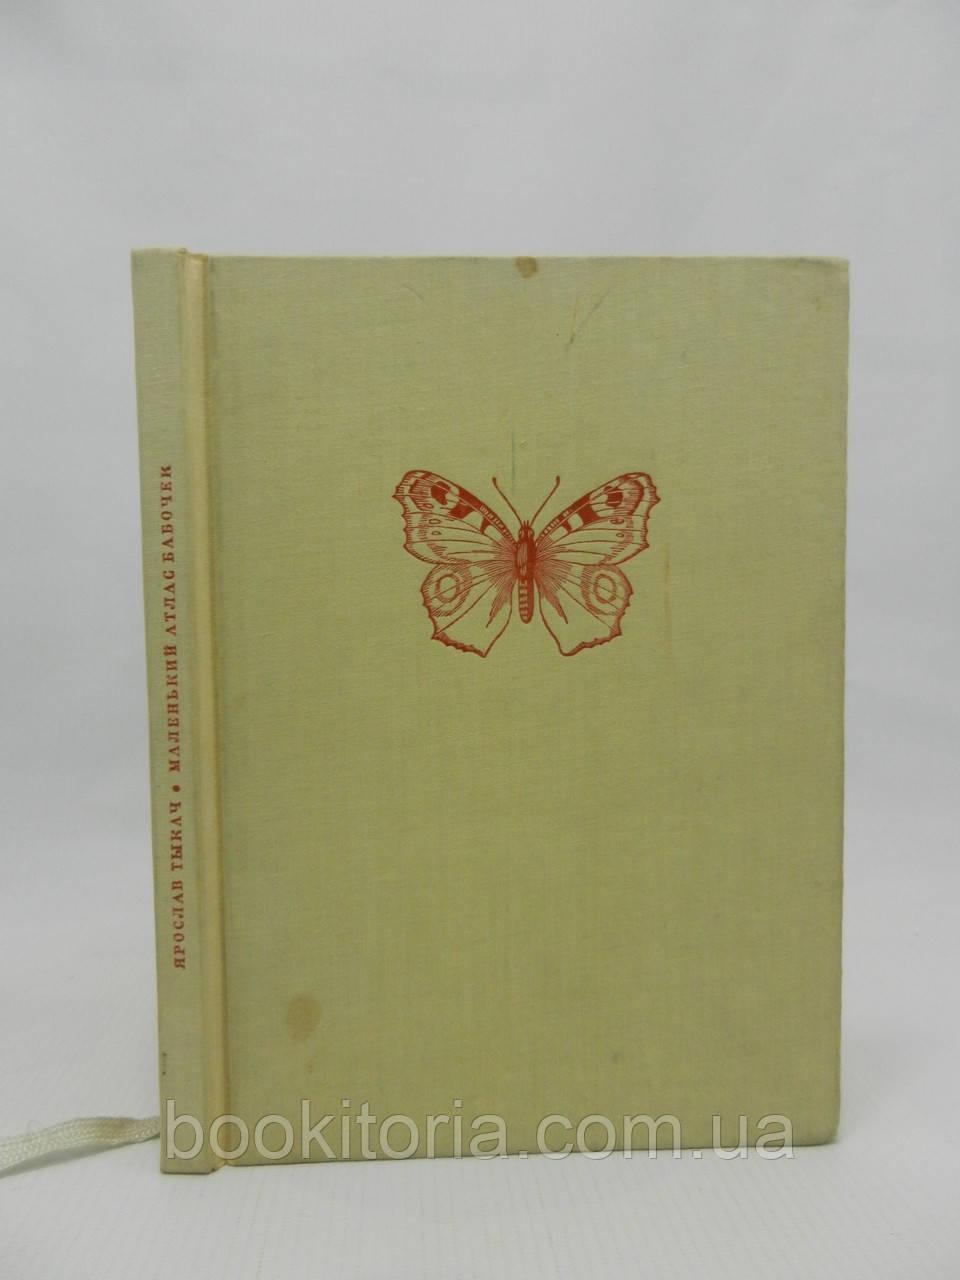 Тыкач Я. Маленький атлас бабочек (б/у).